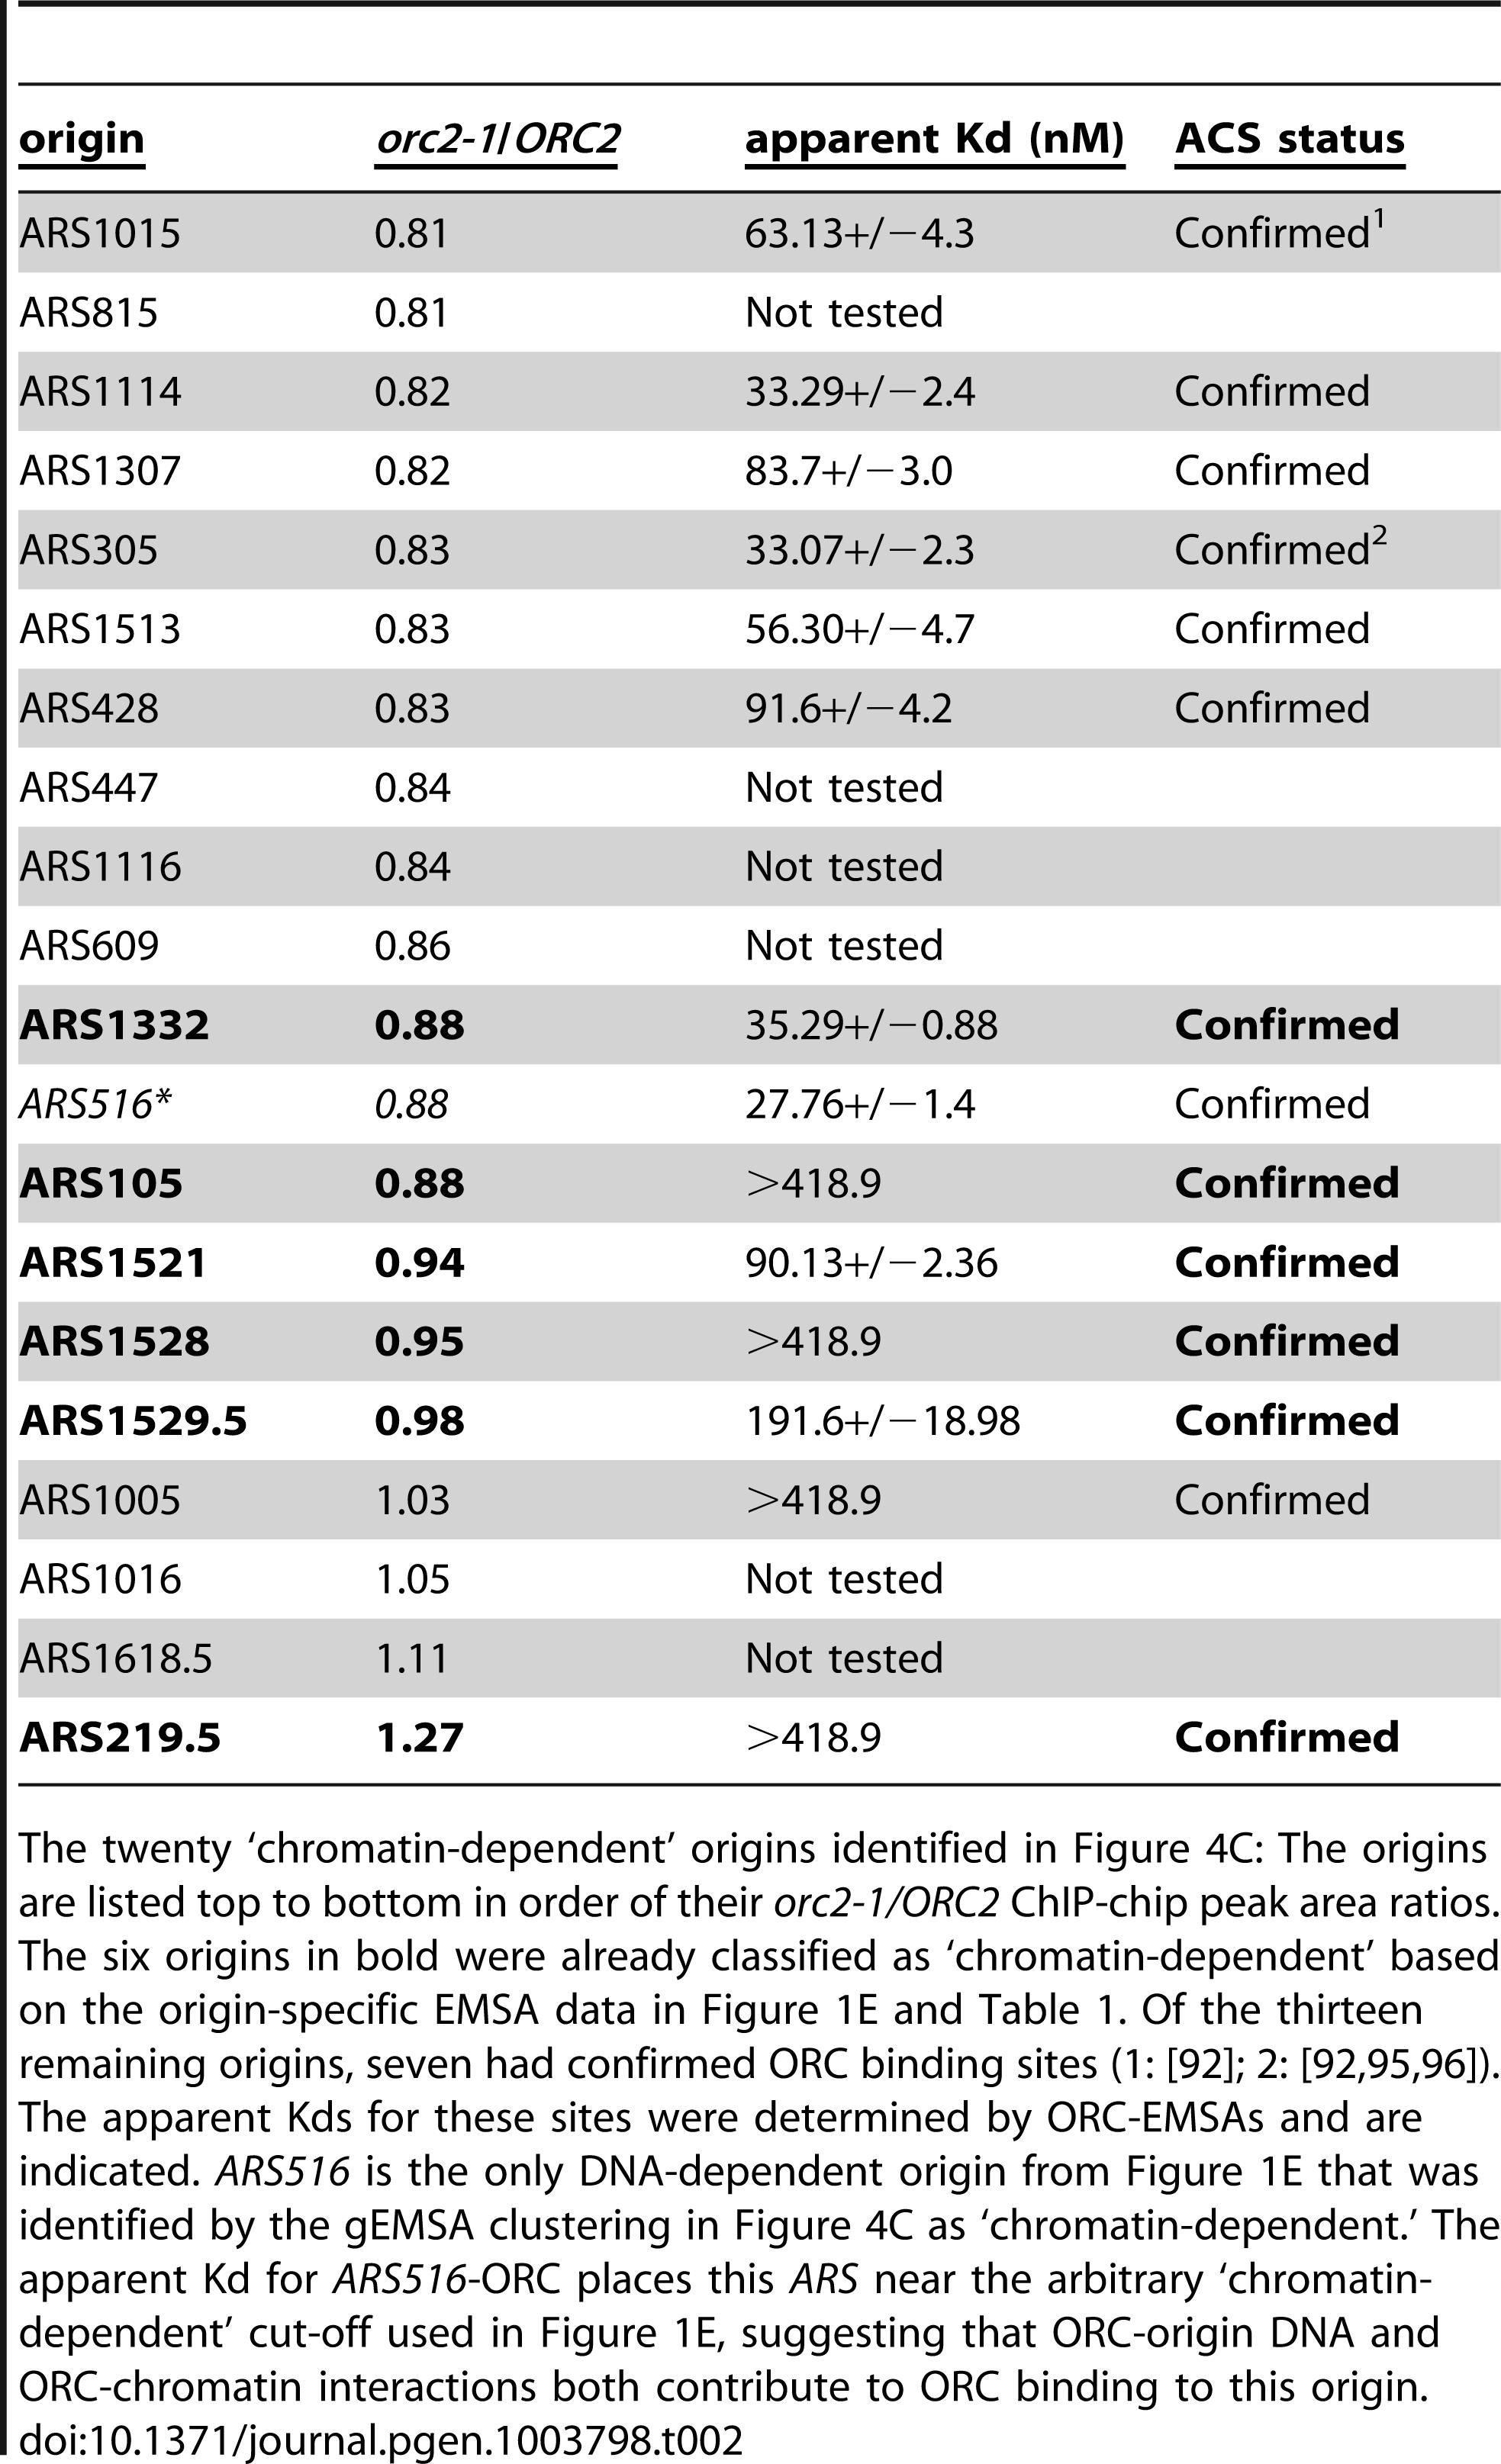 'Chromatin-dependent' origins identified based on clustering of the gEMSA data.